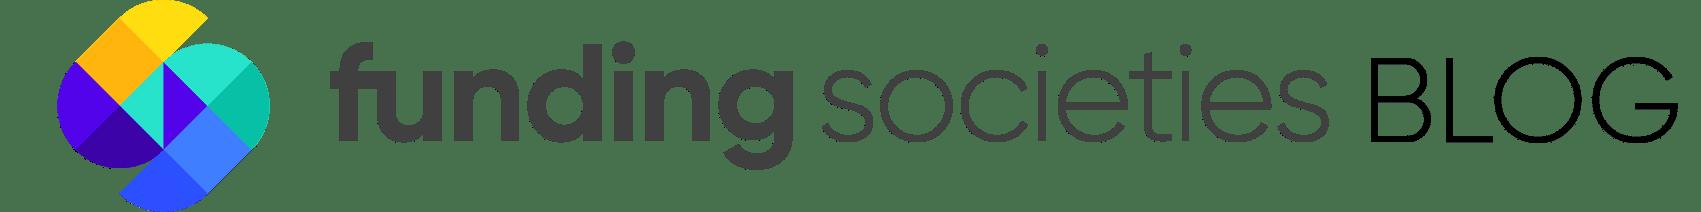 Funding Societies Malaysia Blog